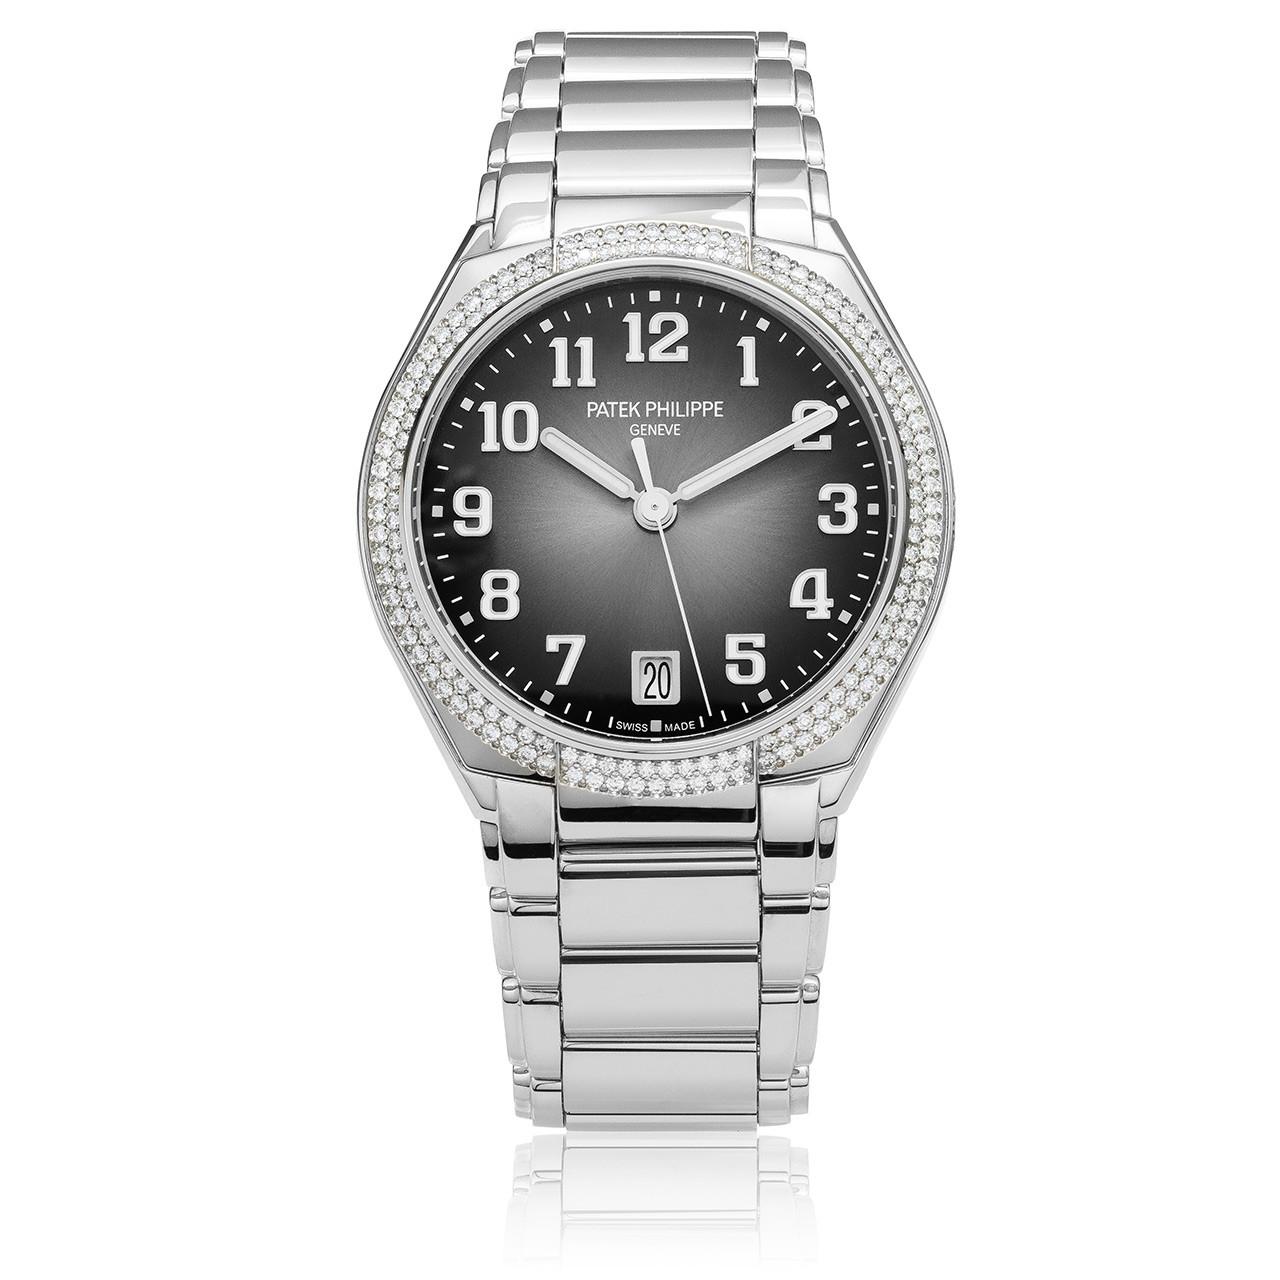 9e7a5ed4fd2 Patek Philippe Twenty~4 Automatic Women s Watch - Shyne Jewelers